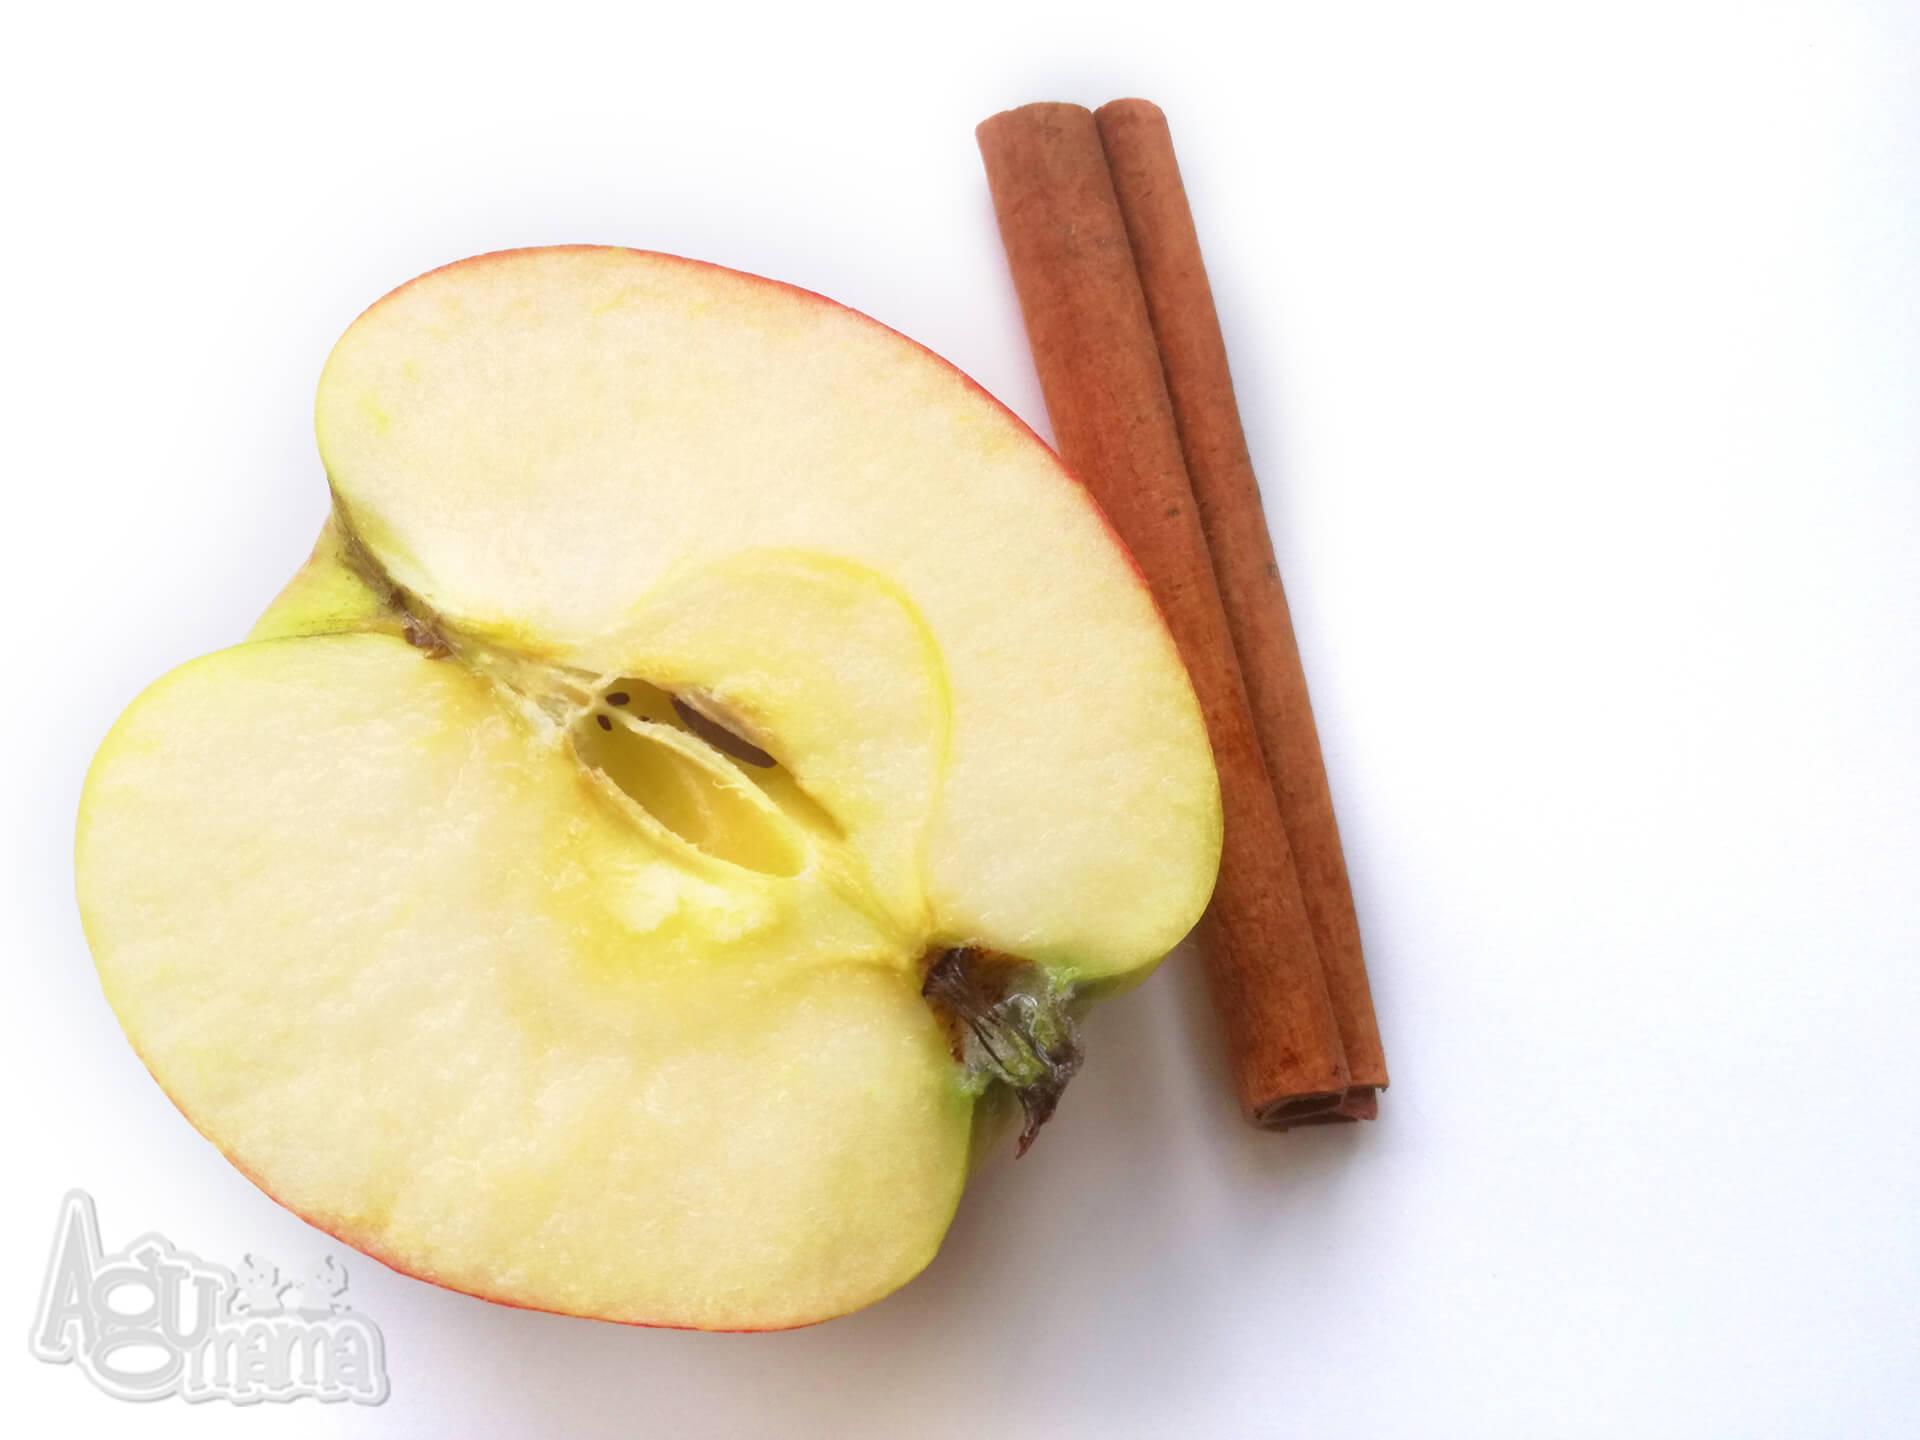 jabłko i laska cynamonu